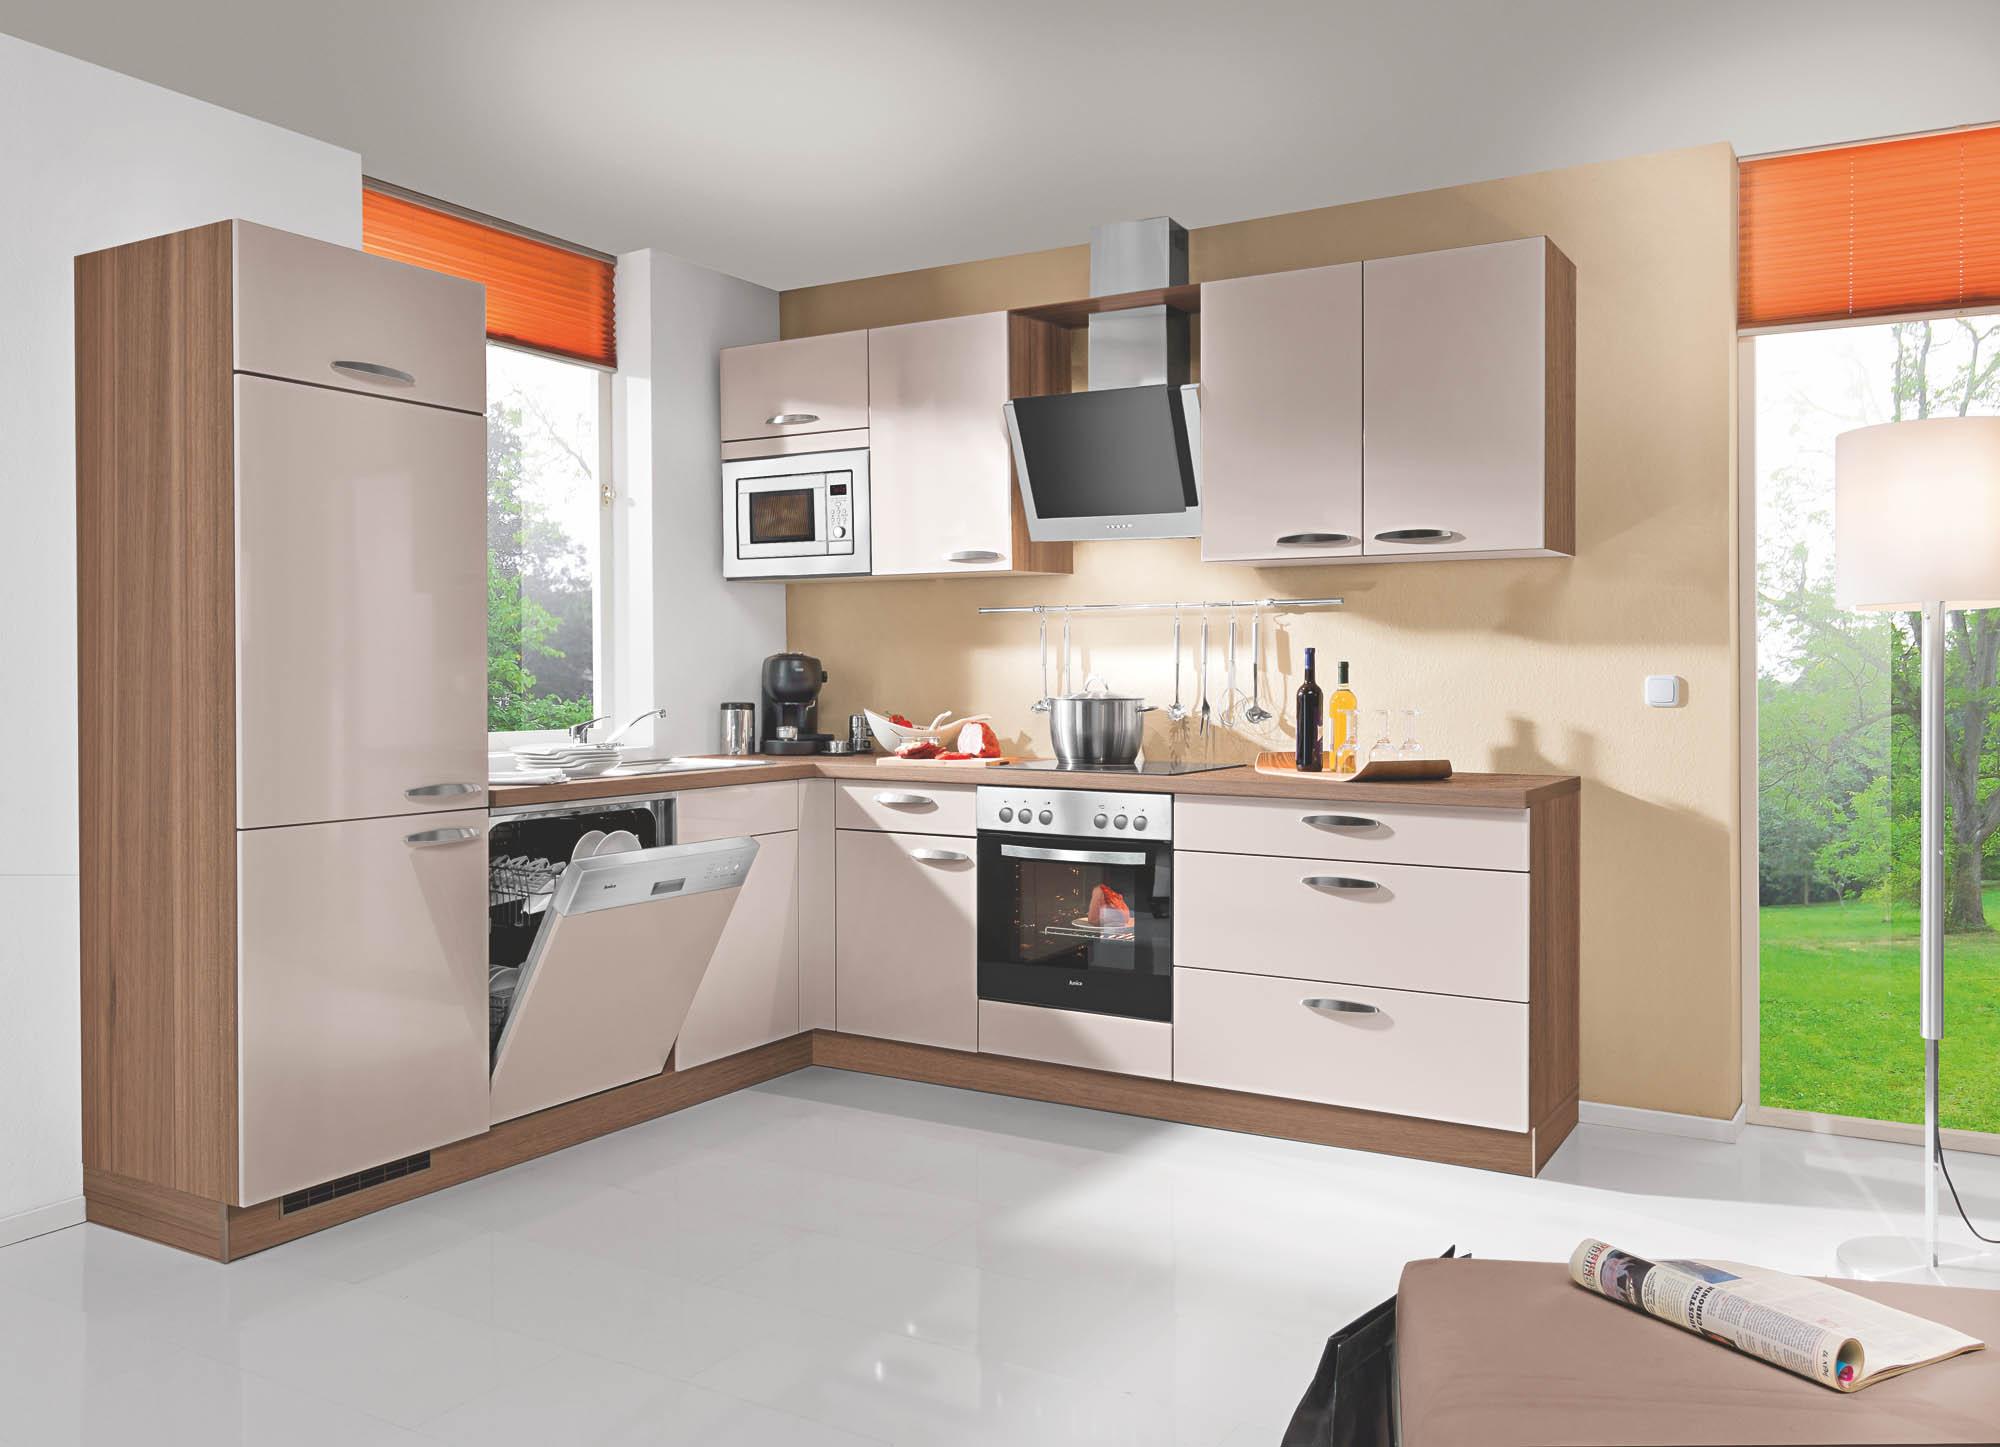 Full Size of Günstige Komplettküche Komplettküche Billig Willhaben Komplettküche Einbauküche Ohne Kühlschrank Küche Einbauküche Ohne Kühlschrank